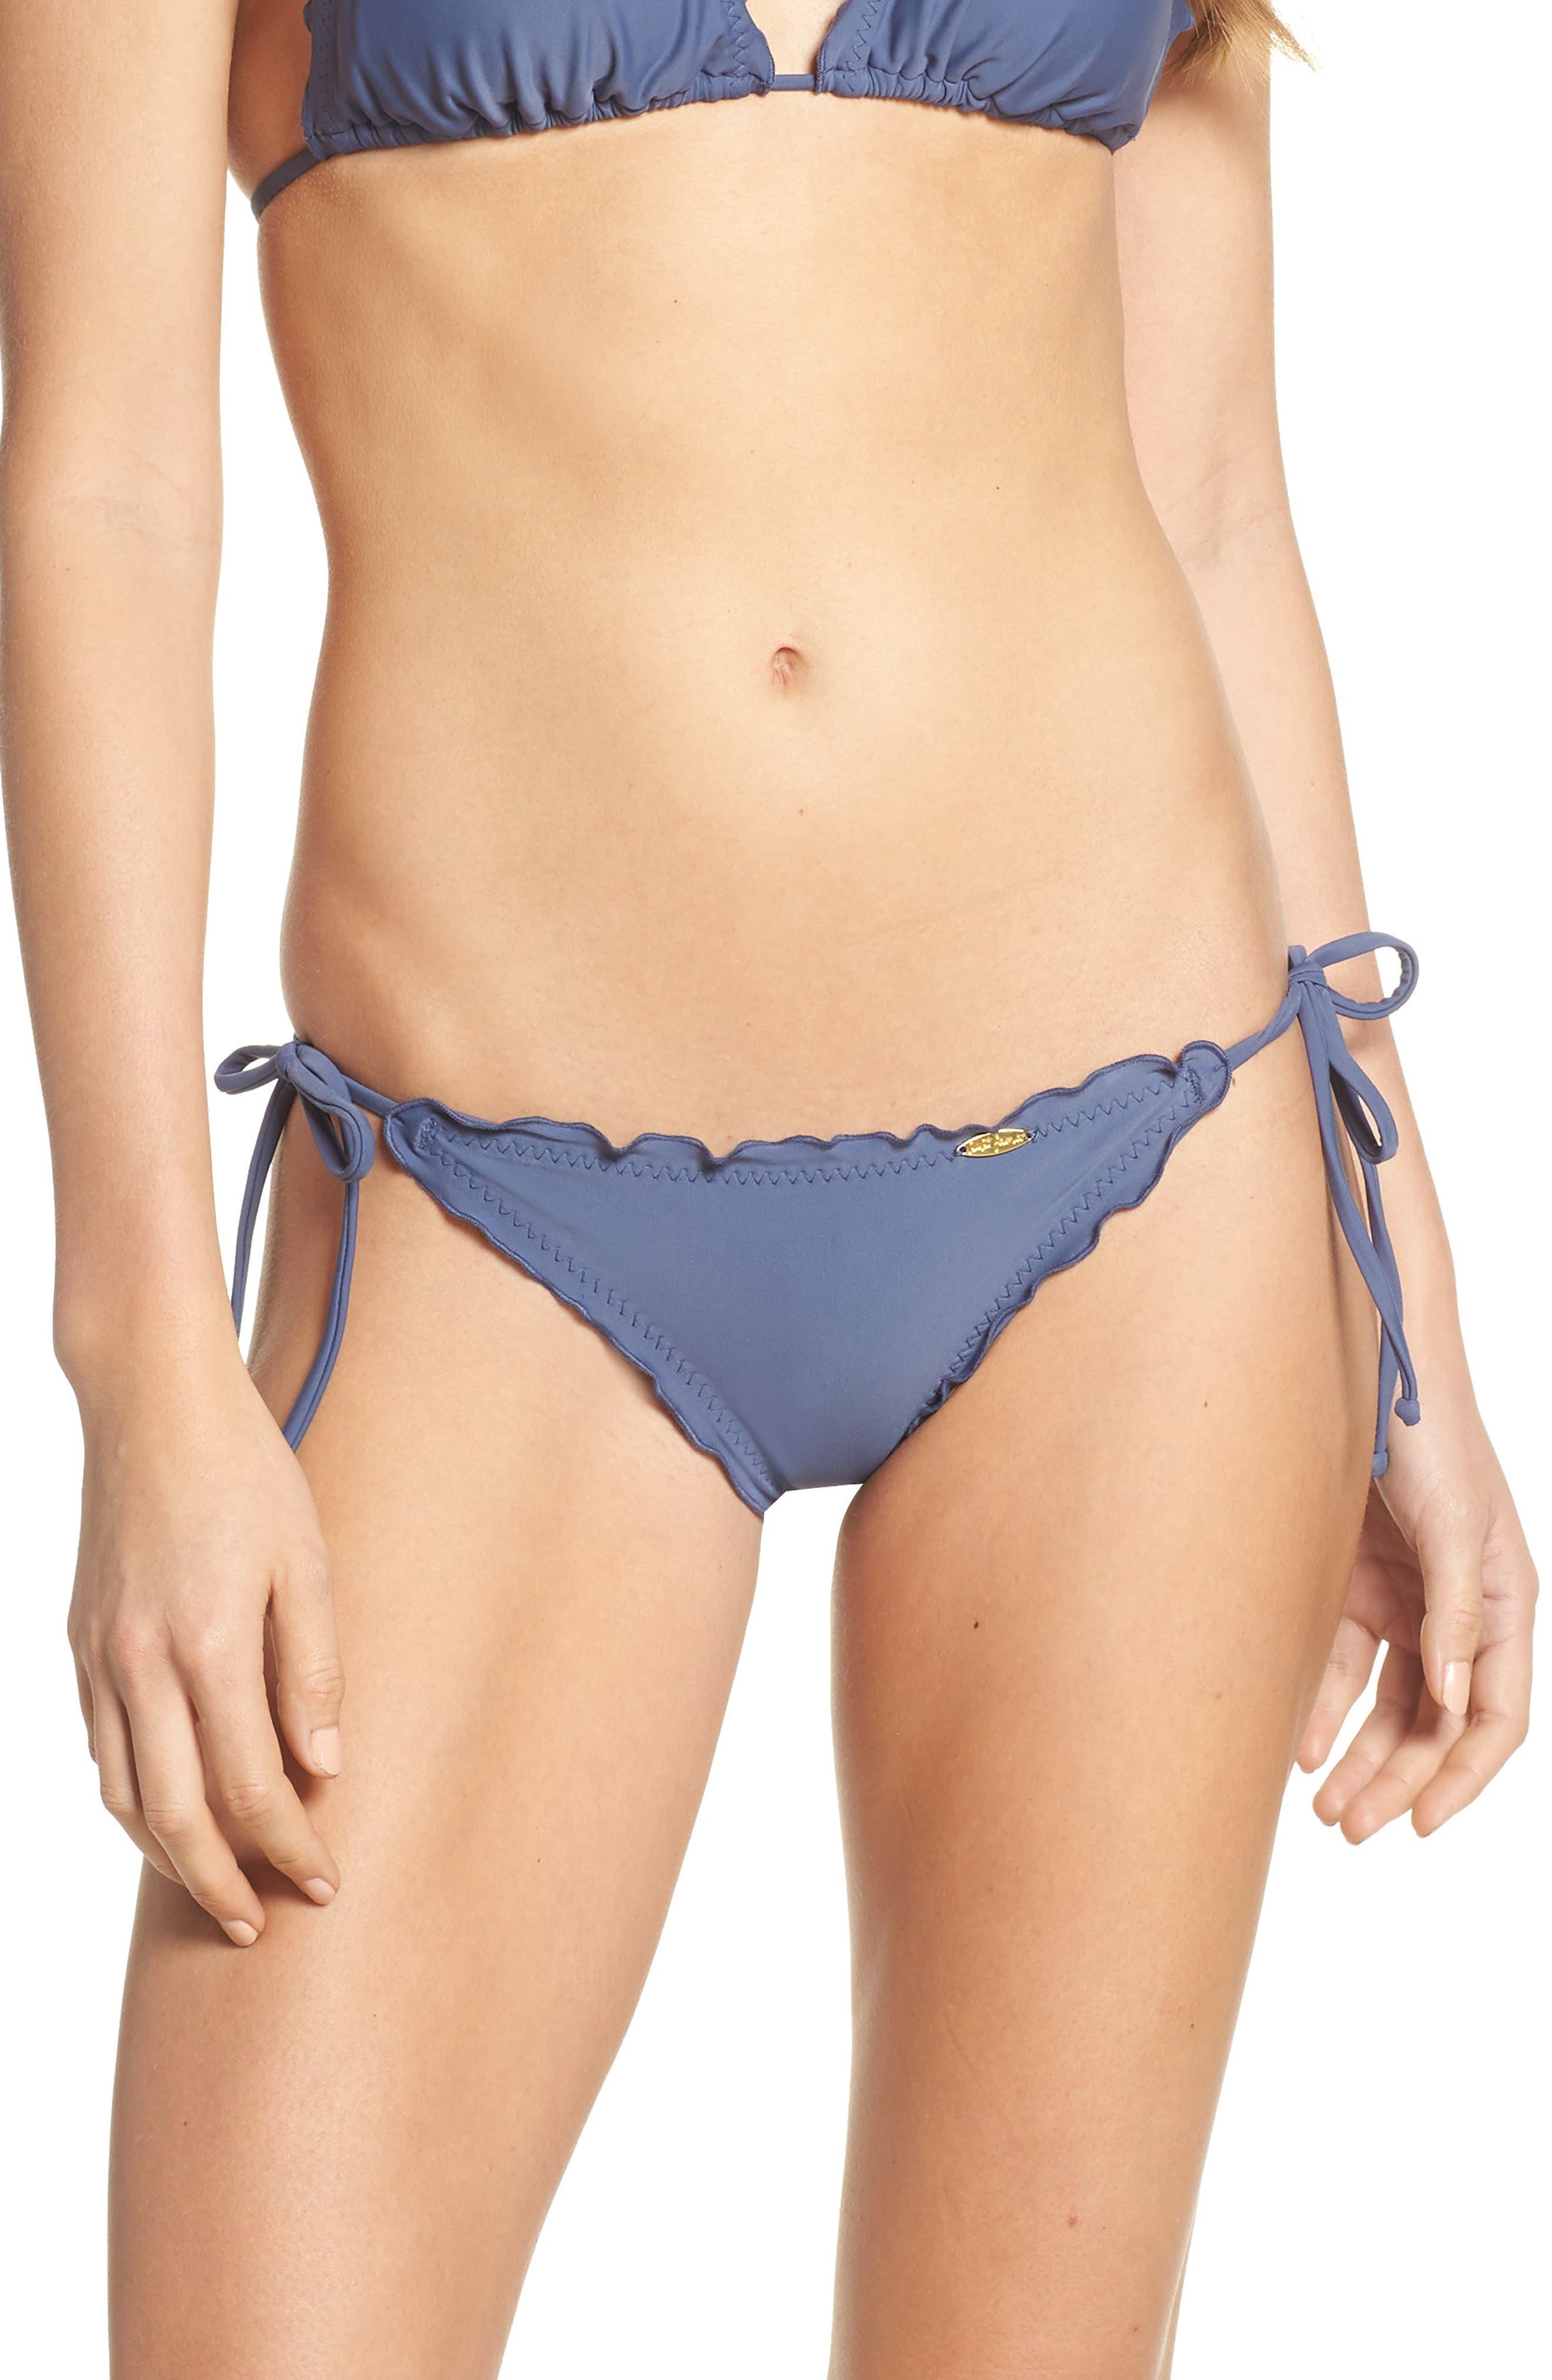 LULI FAMA, Wavy Brazilian Side Tie Bikini Bottoms, Main thumbnail 1, color, AZUELJO